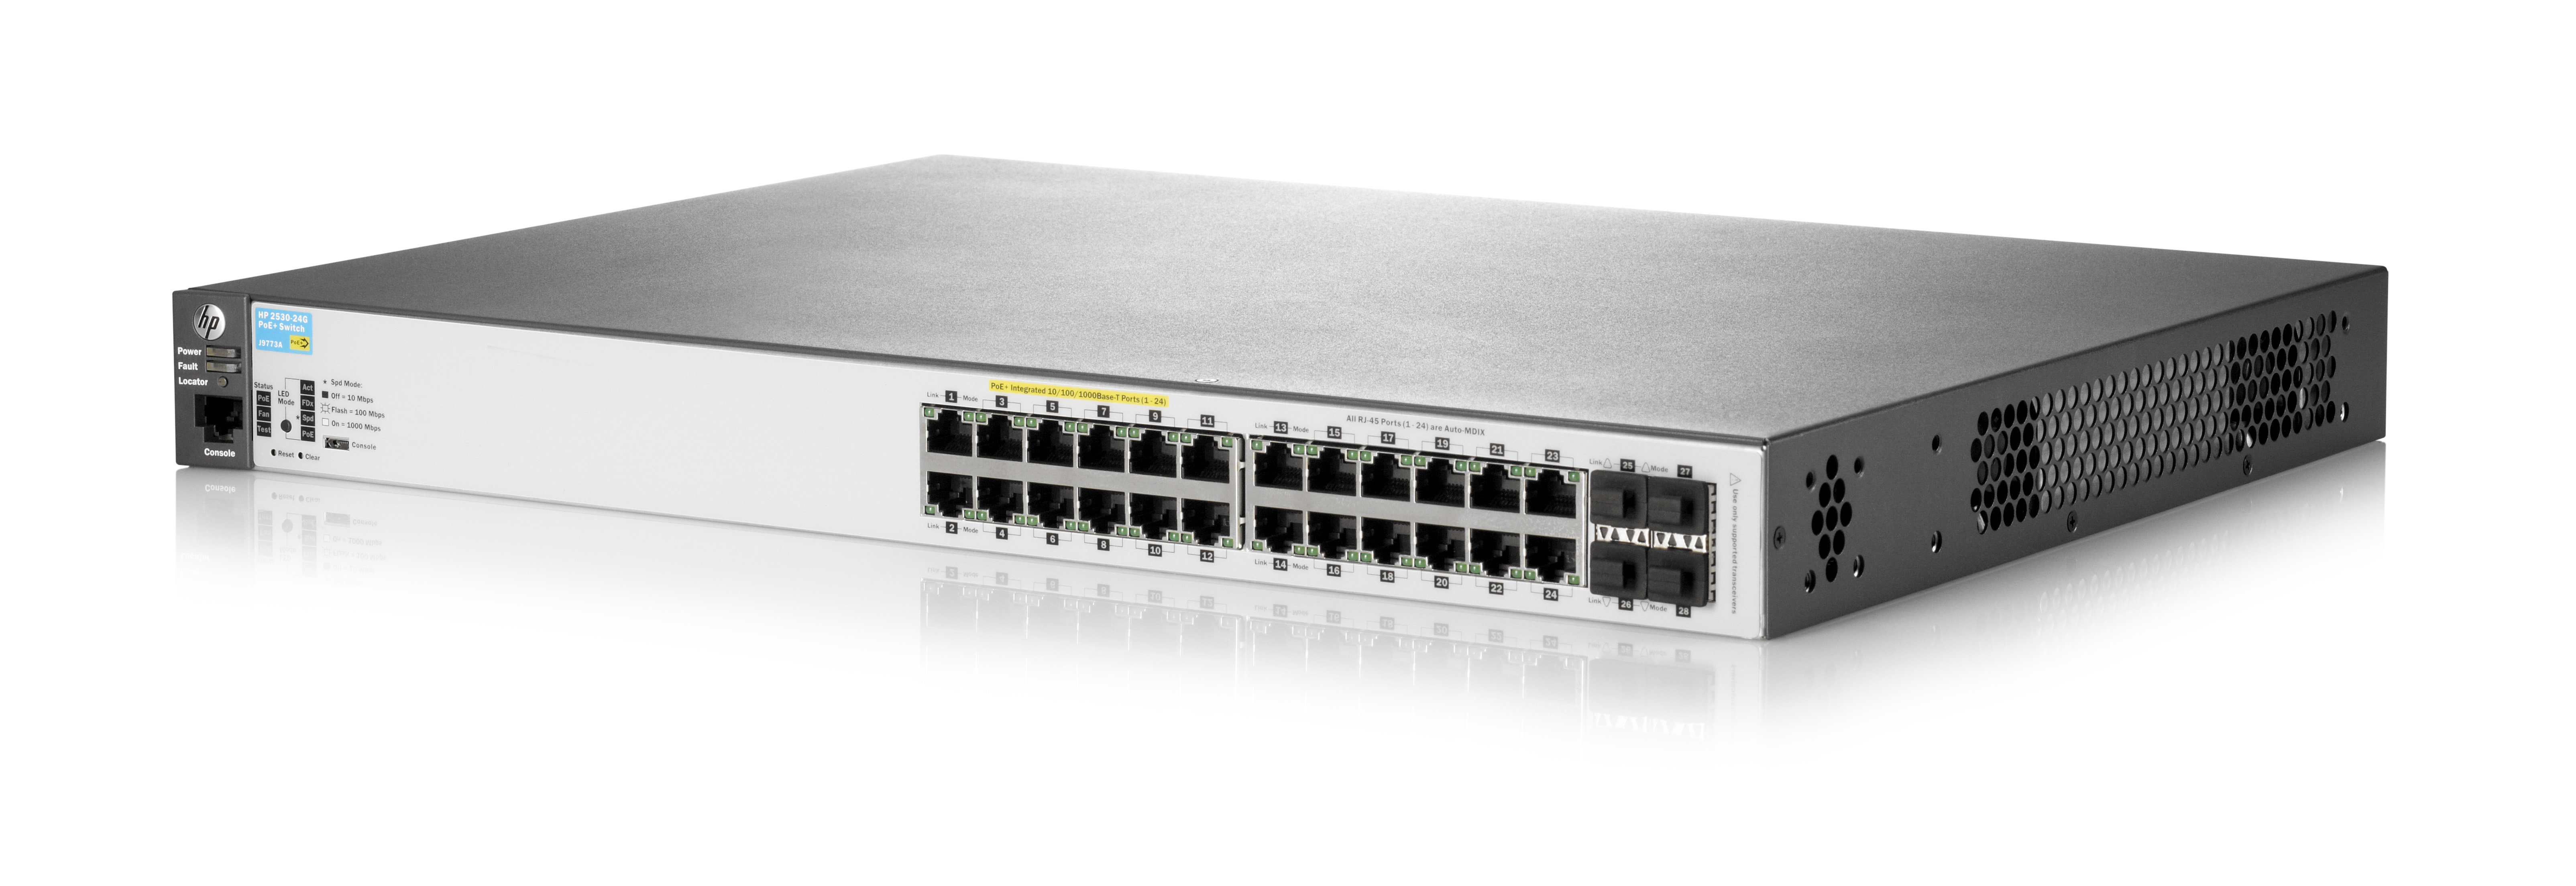 HPE Aruba 2530-24G-PoE+ (Voltage: AC 120/230 V (50/60 Hz))